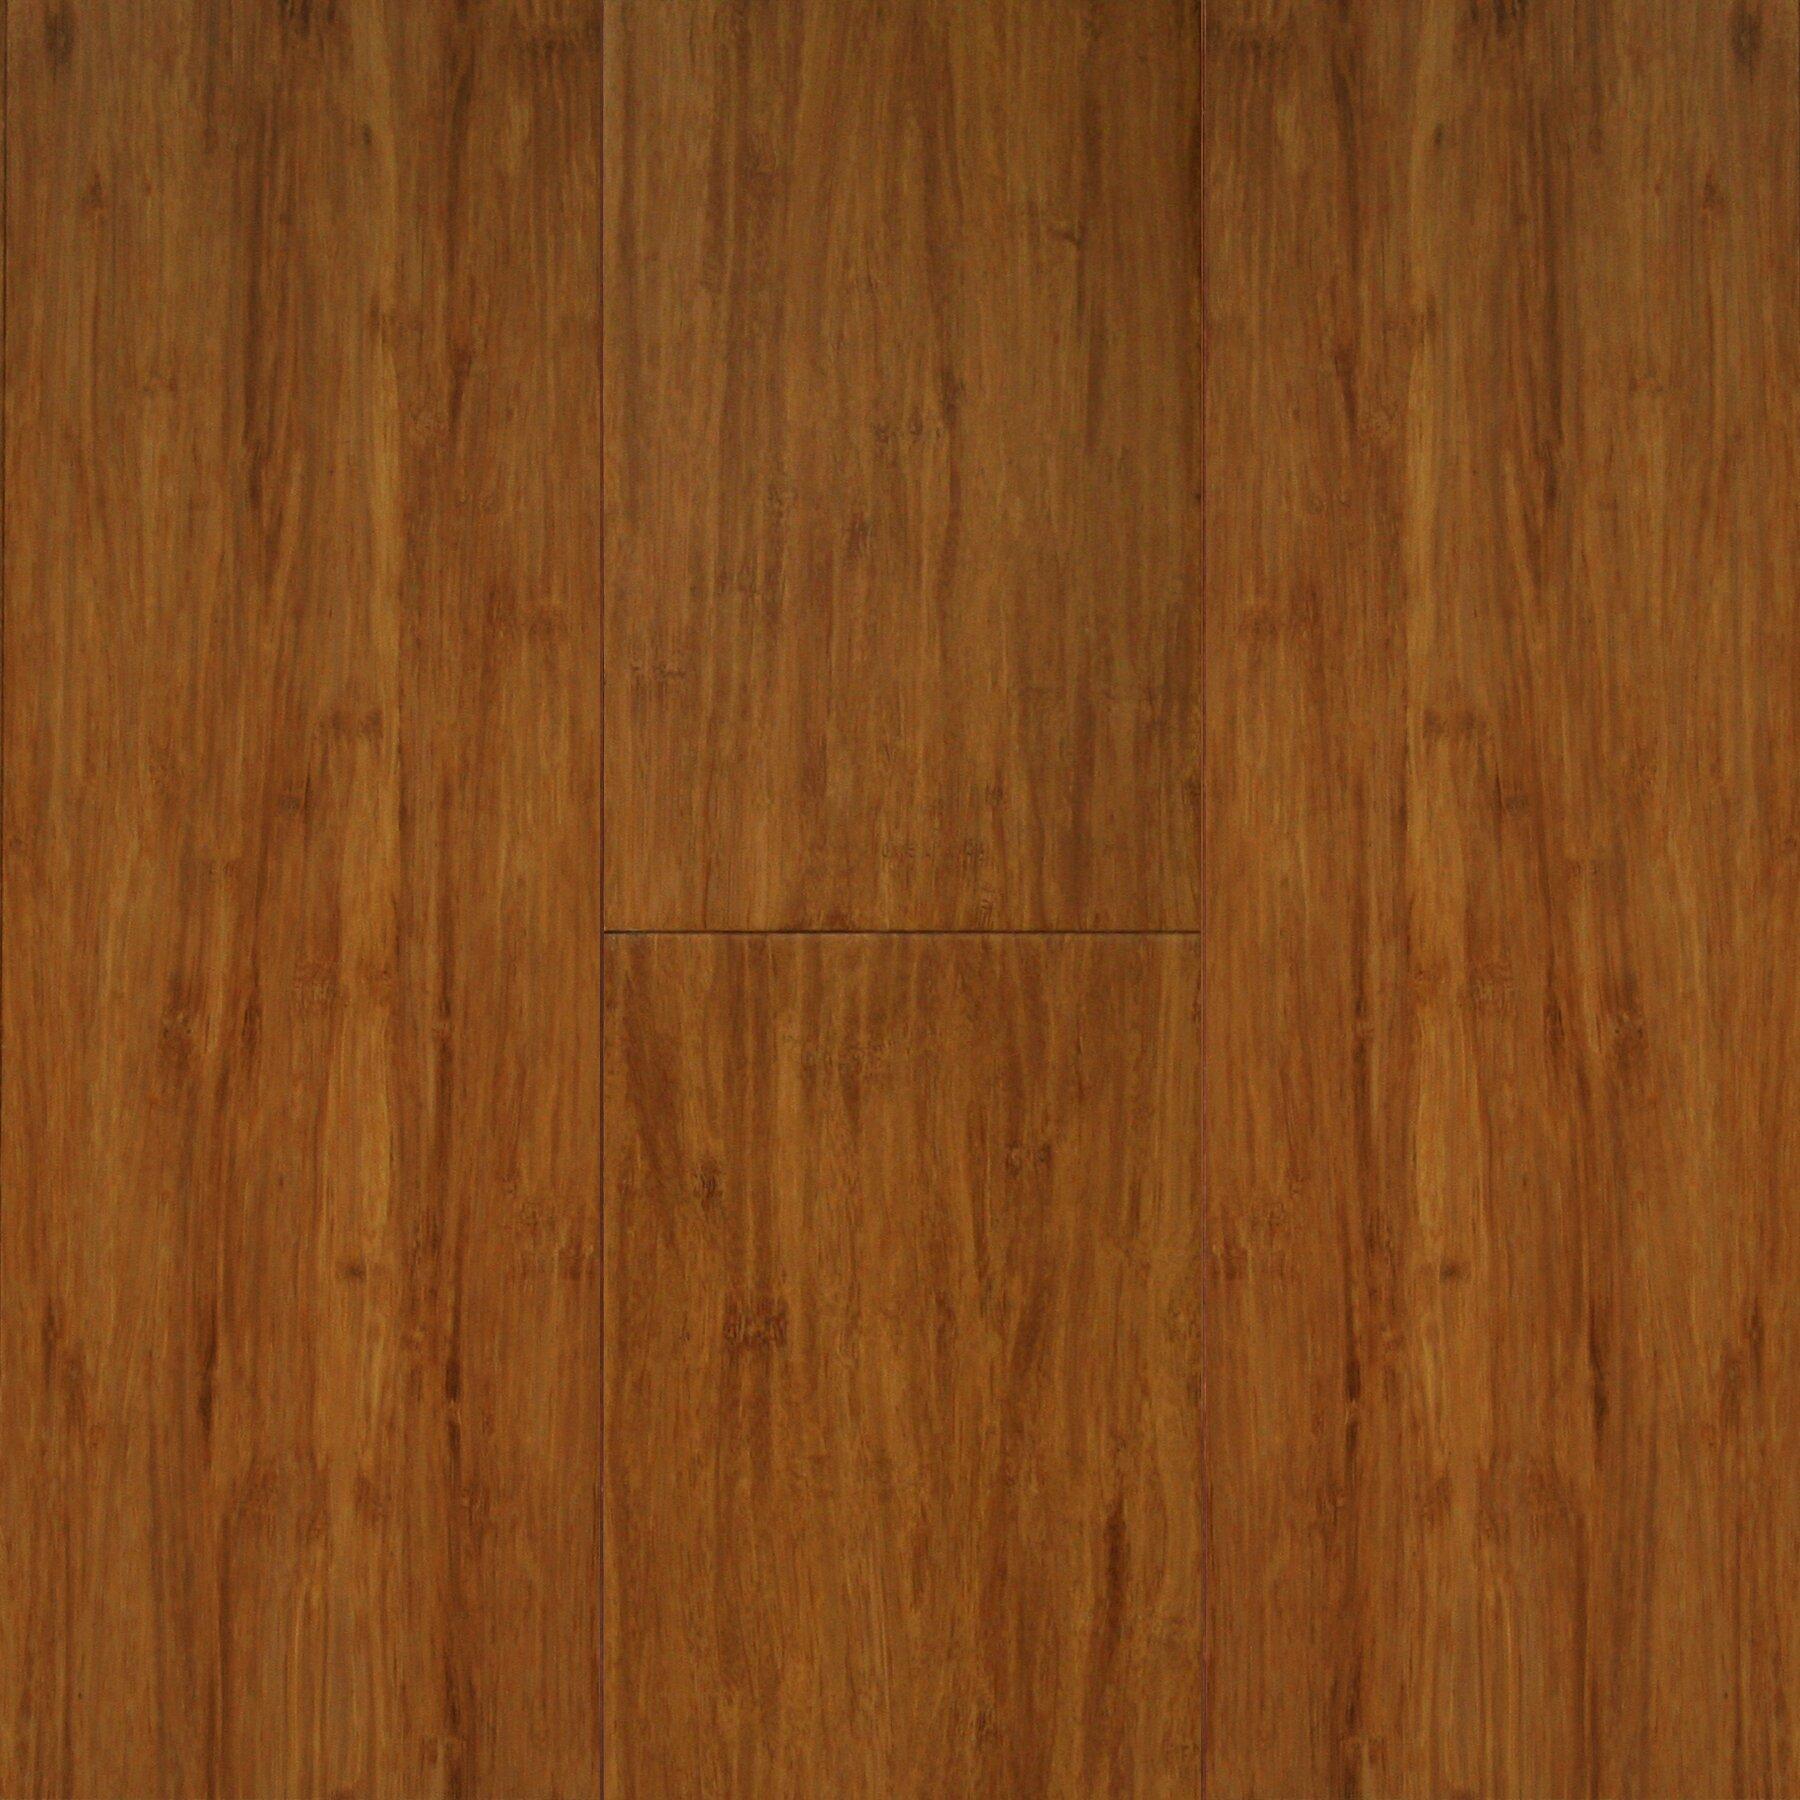 Us floors 5 5 8 engineered bamboo hardwood flooring in for Engineered bamboo flooring